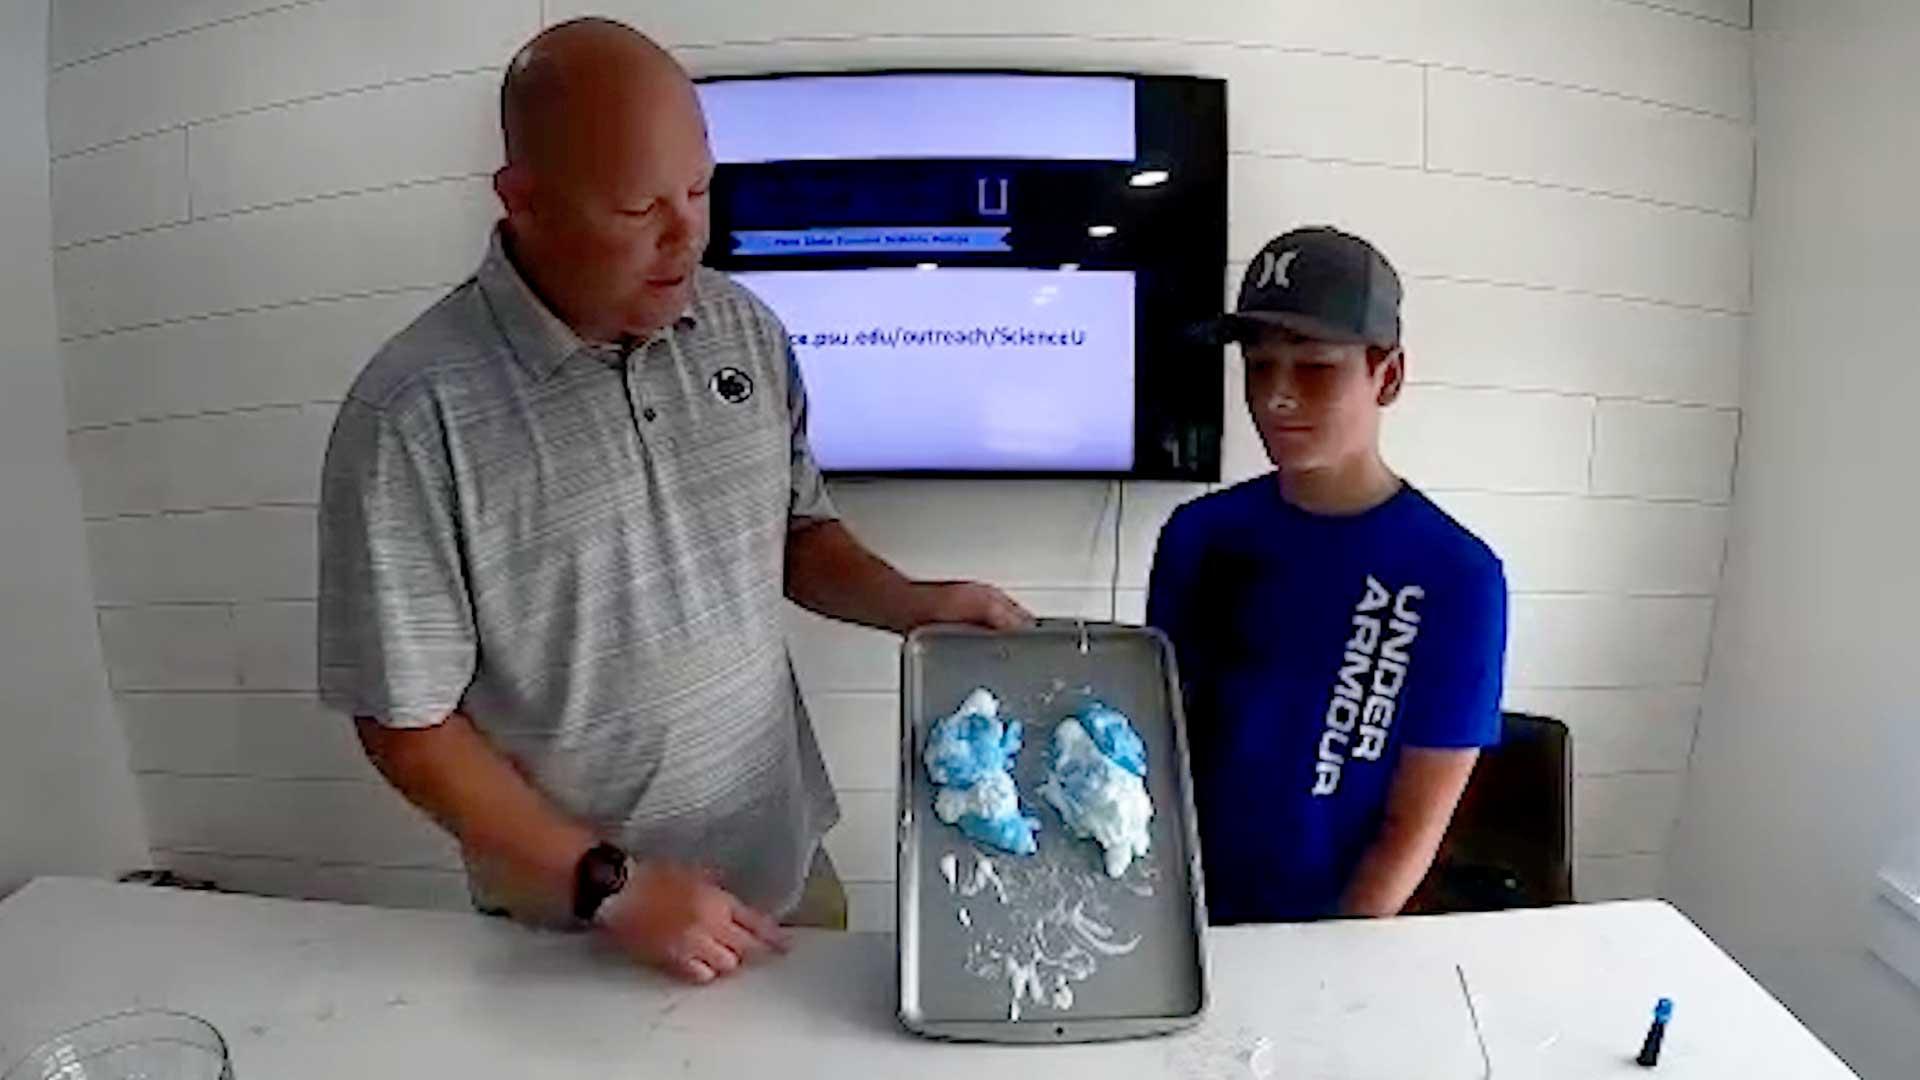 Justin Hazelton demonstrates how glaciers move